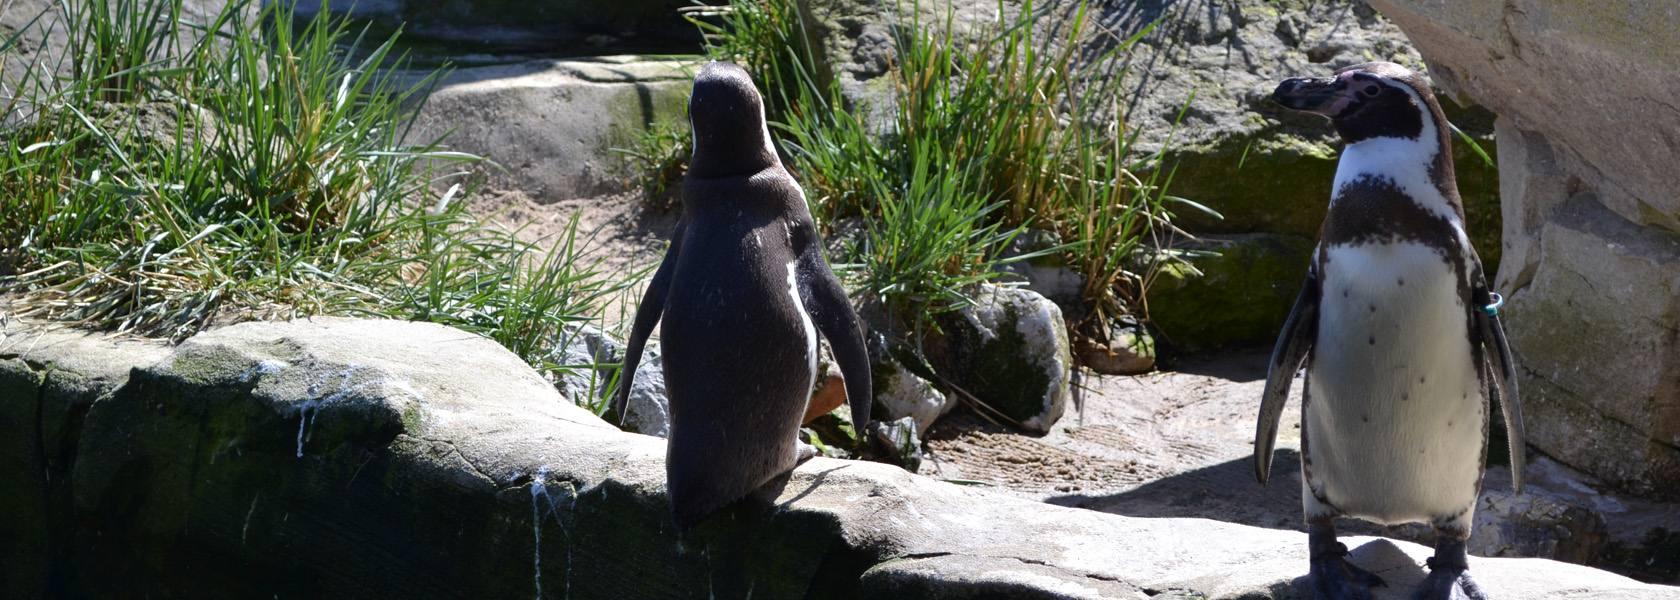 Zoo am Meer, © Mailin_Knoke, Erlebnis Bremerhaven GmbH